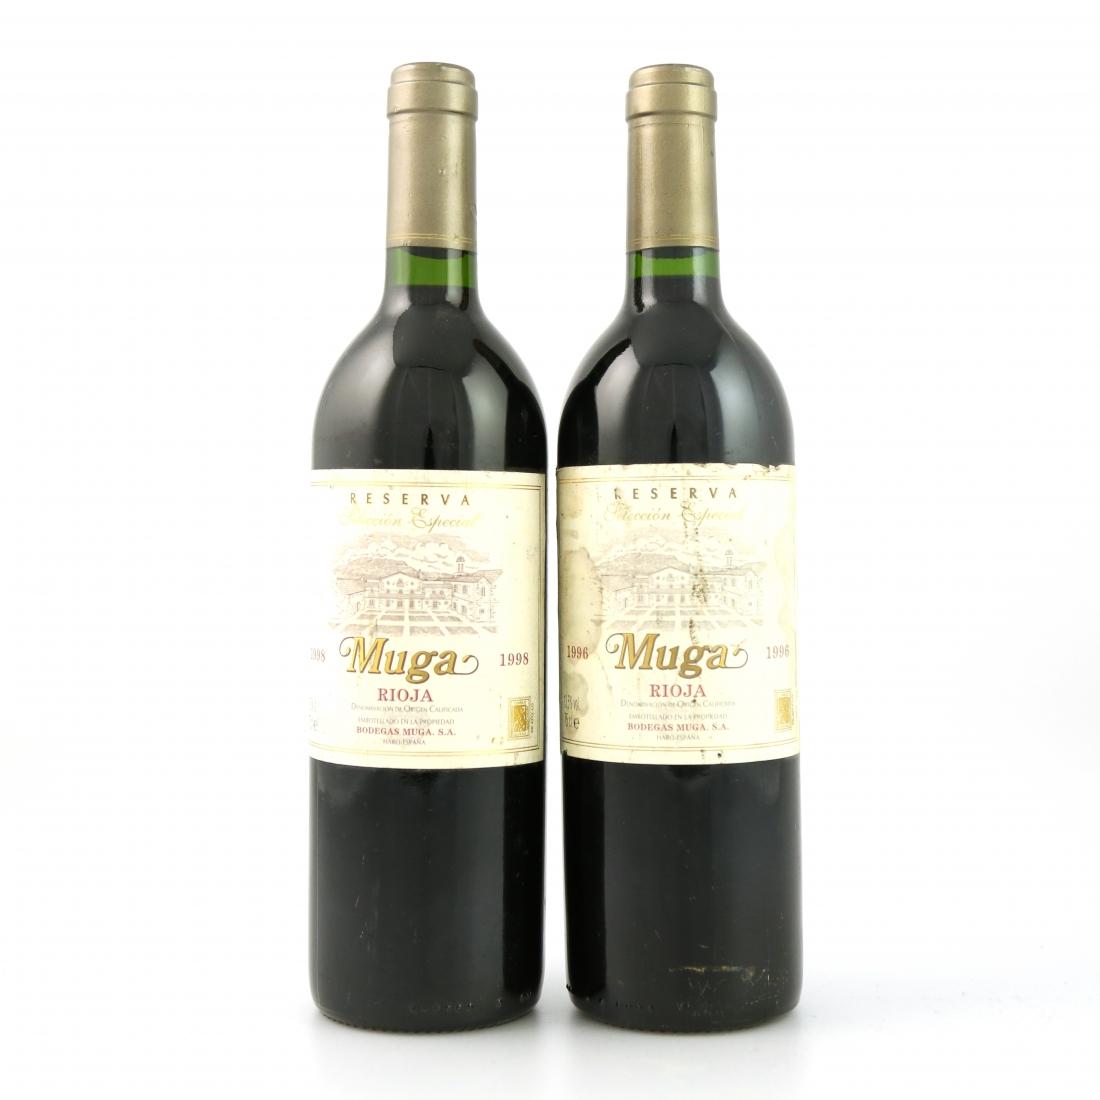 Muga 1996 & 1998 Rioja Reserva 2x75cl